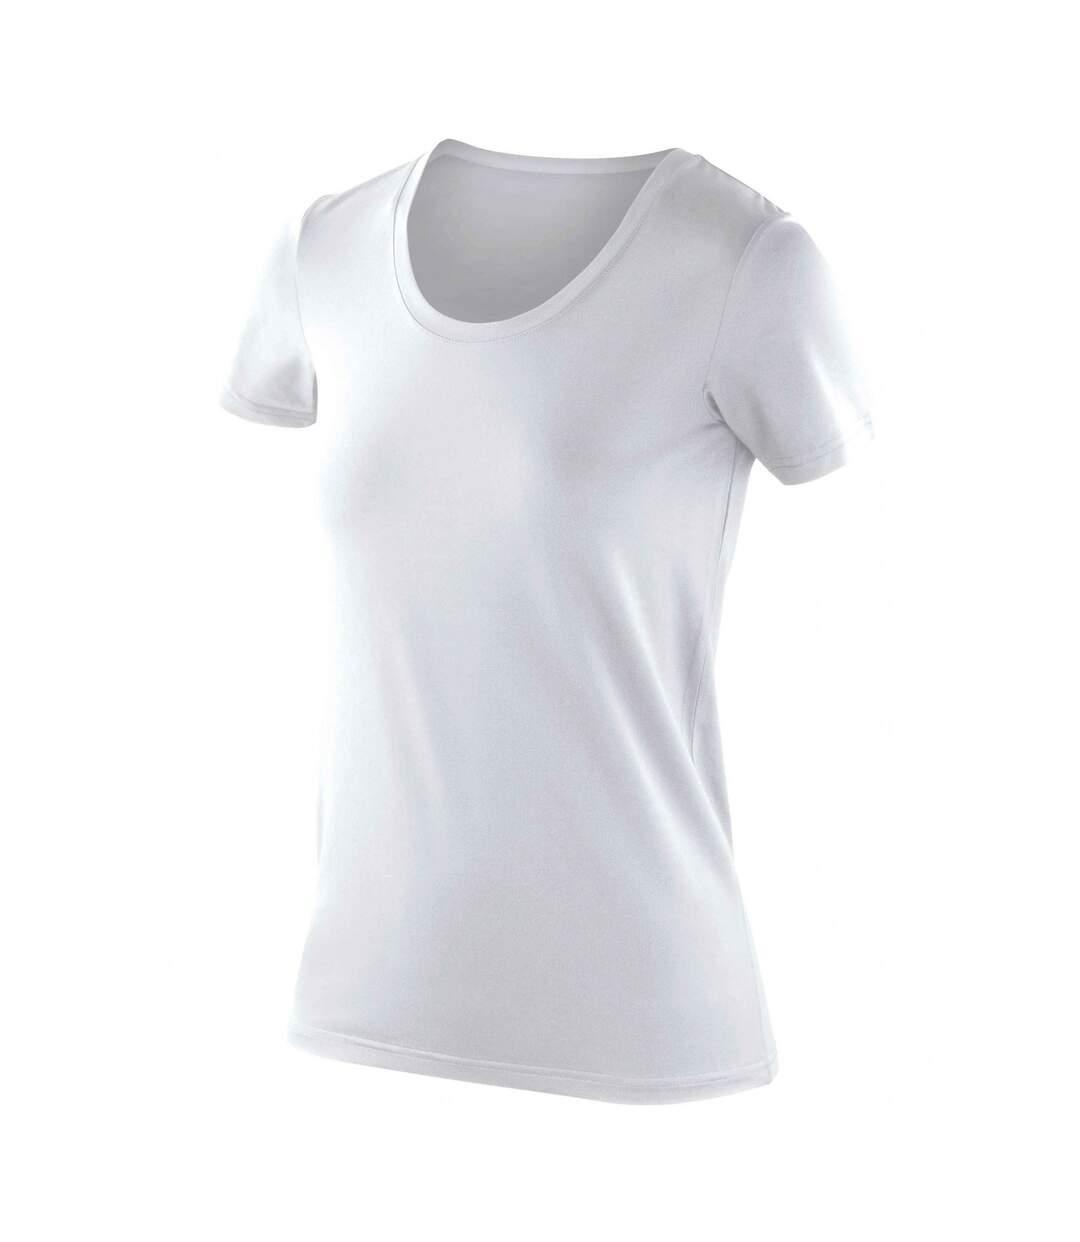 Spiro - T-Shirt À Stretch À Manches Courtes - Femme (Blanc) - UTRW5169